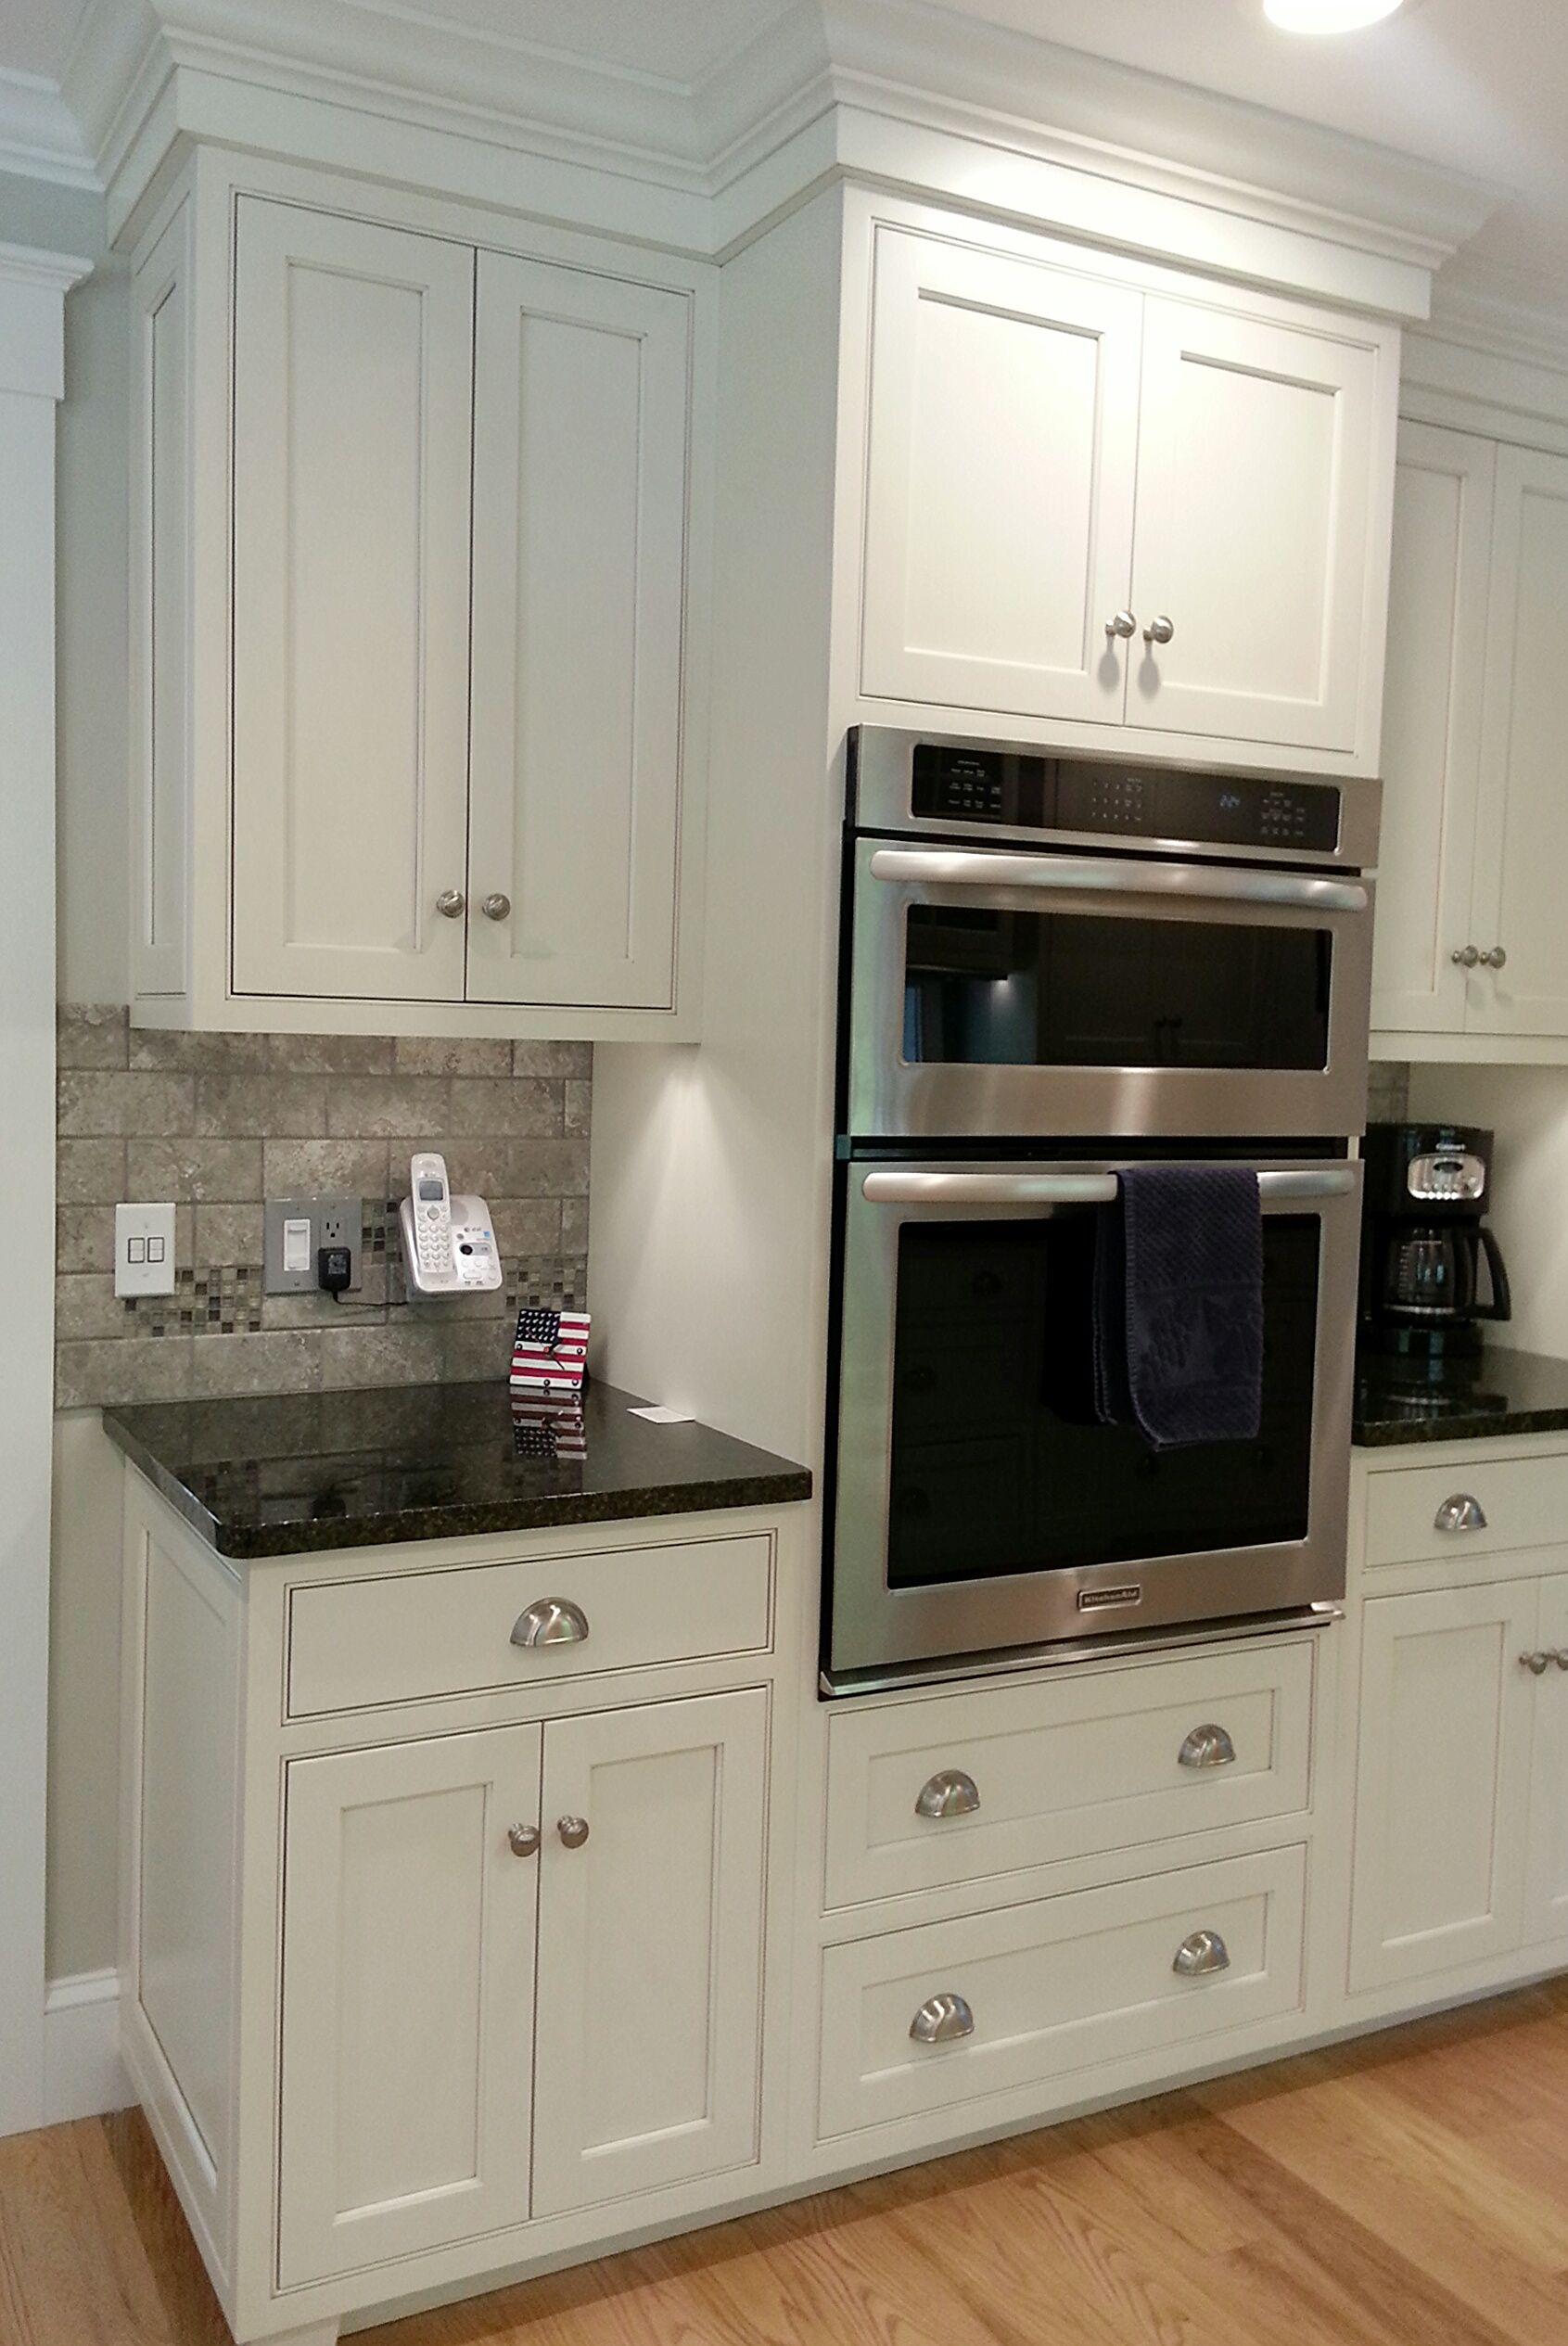 White Millbrook Kitchen With Granite Countertops 2 Of 3 Granite Countertops Kitchen Kitchen Granite Countertops